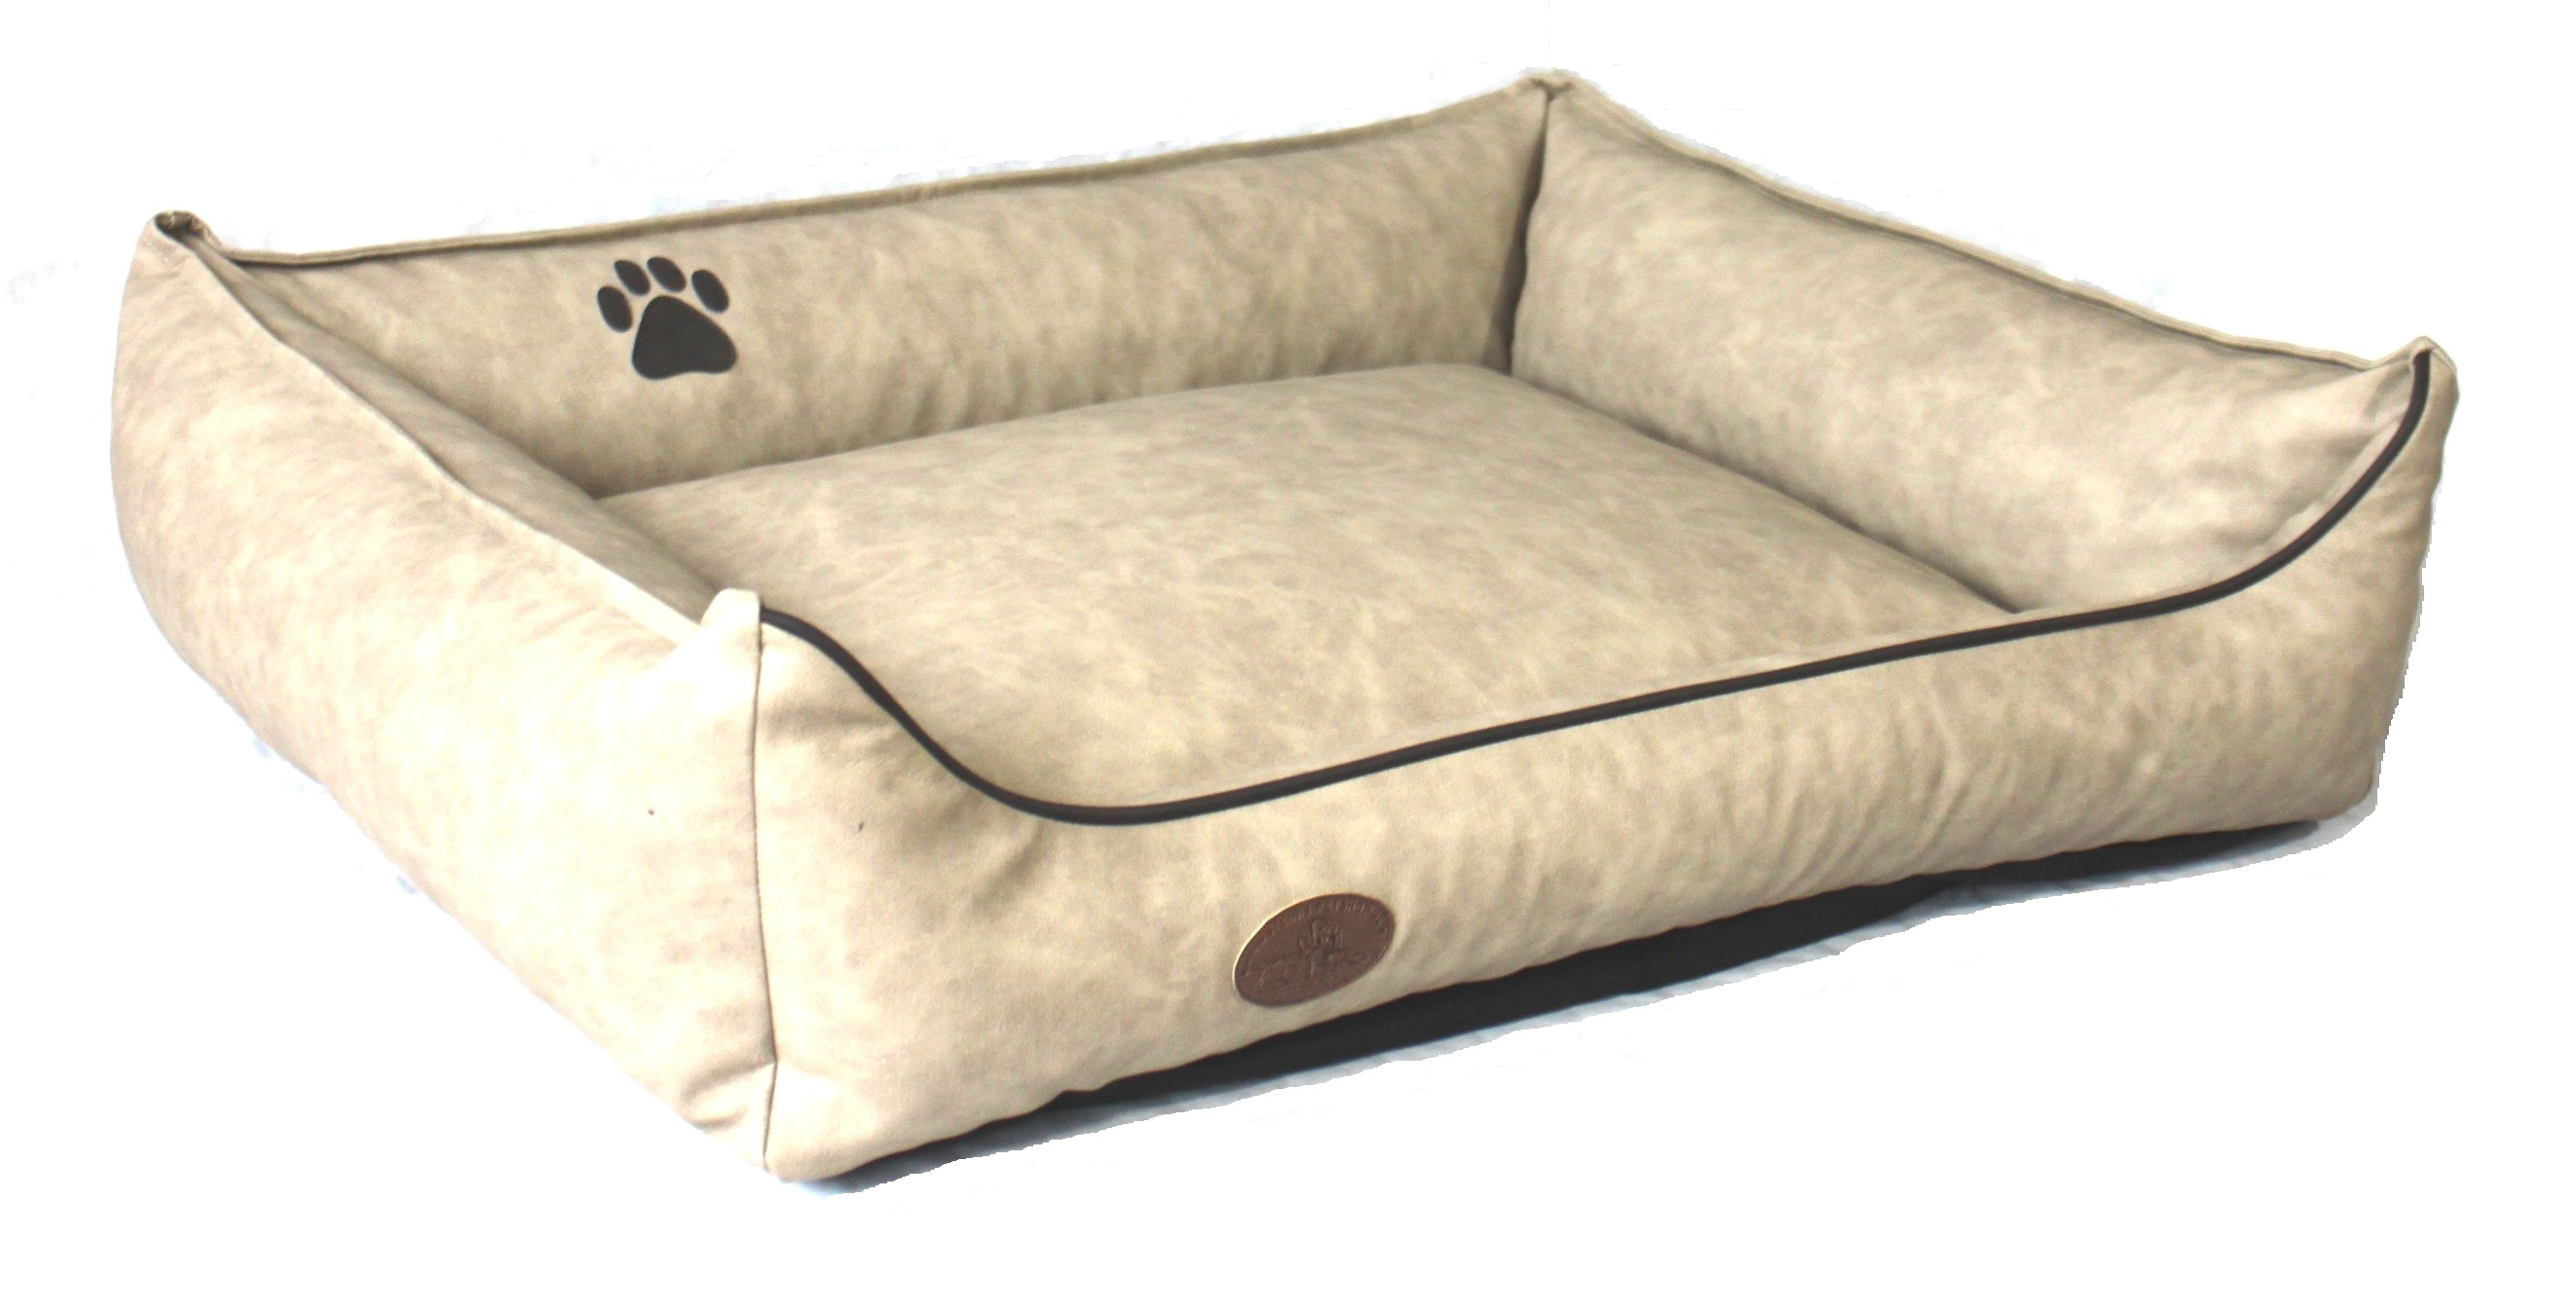 Hundebett SHADOW mit Kunstlederbezug aus Steinis-Petshop